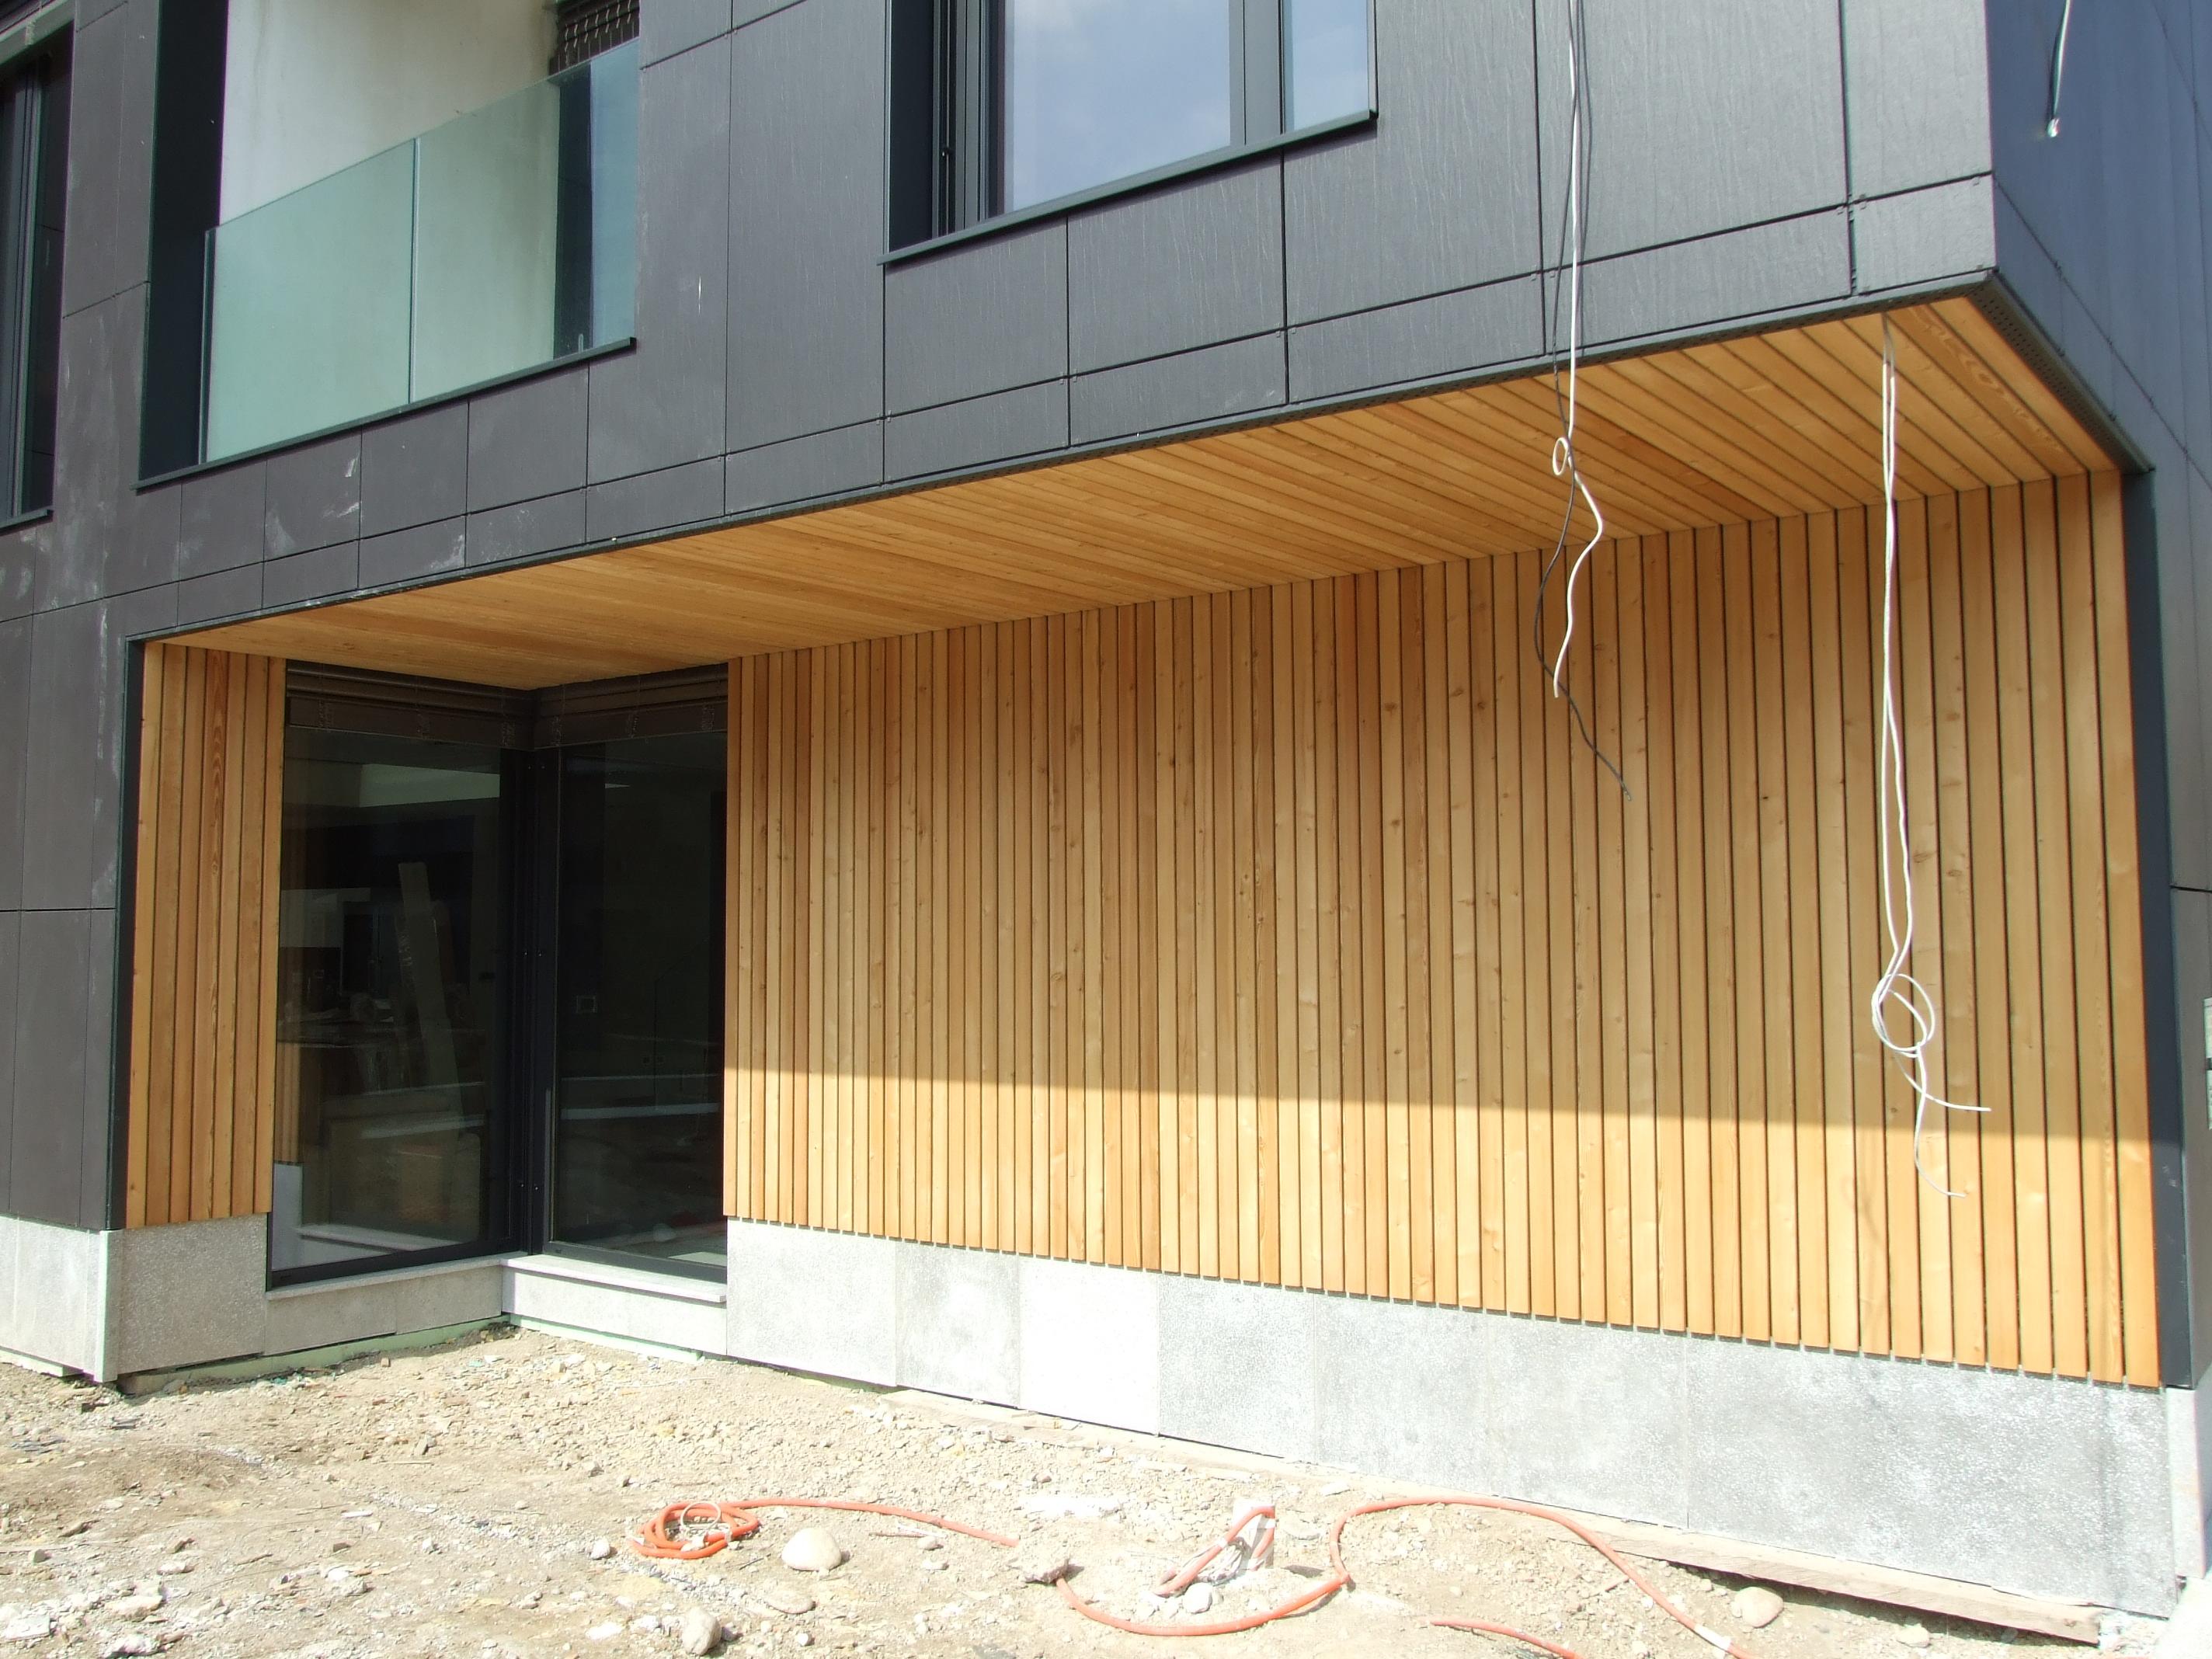 Lesena fasada Vič - letve 24 x 70 mm sibirski macesen